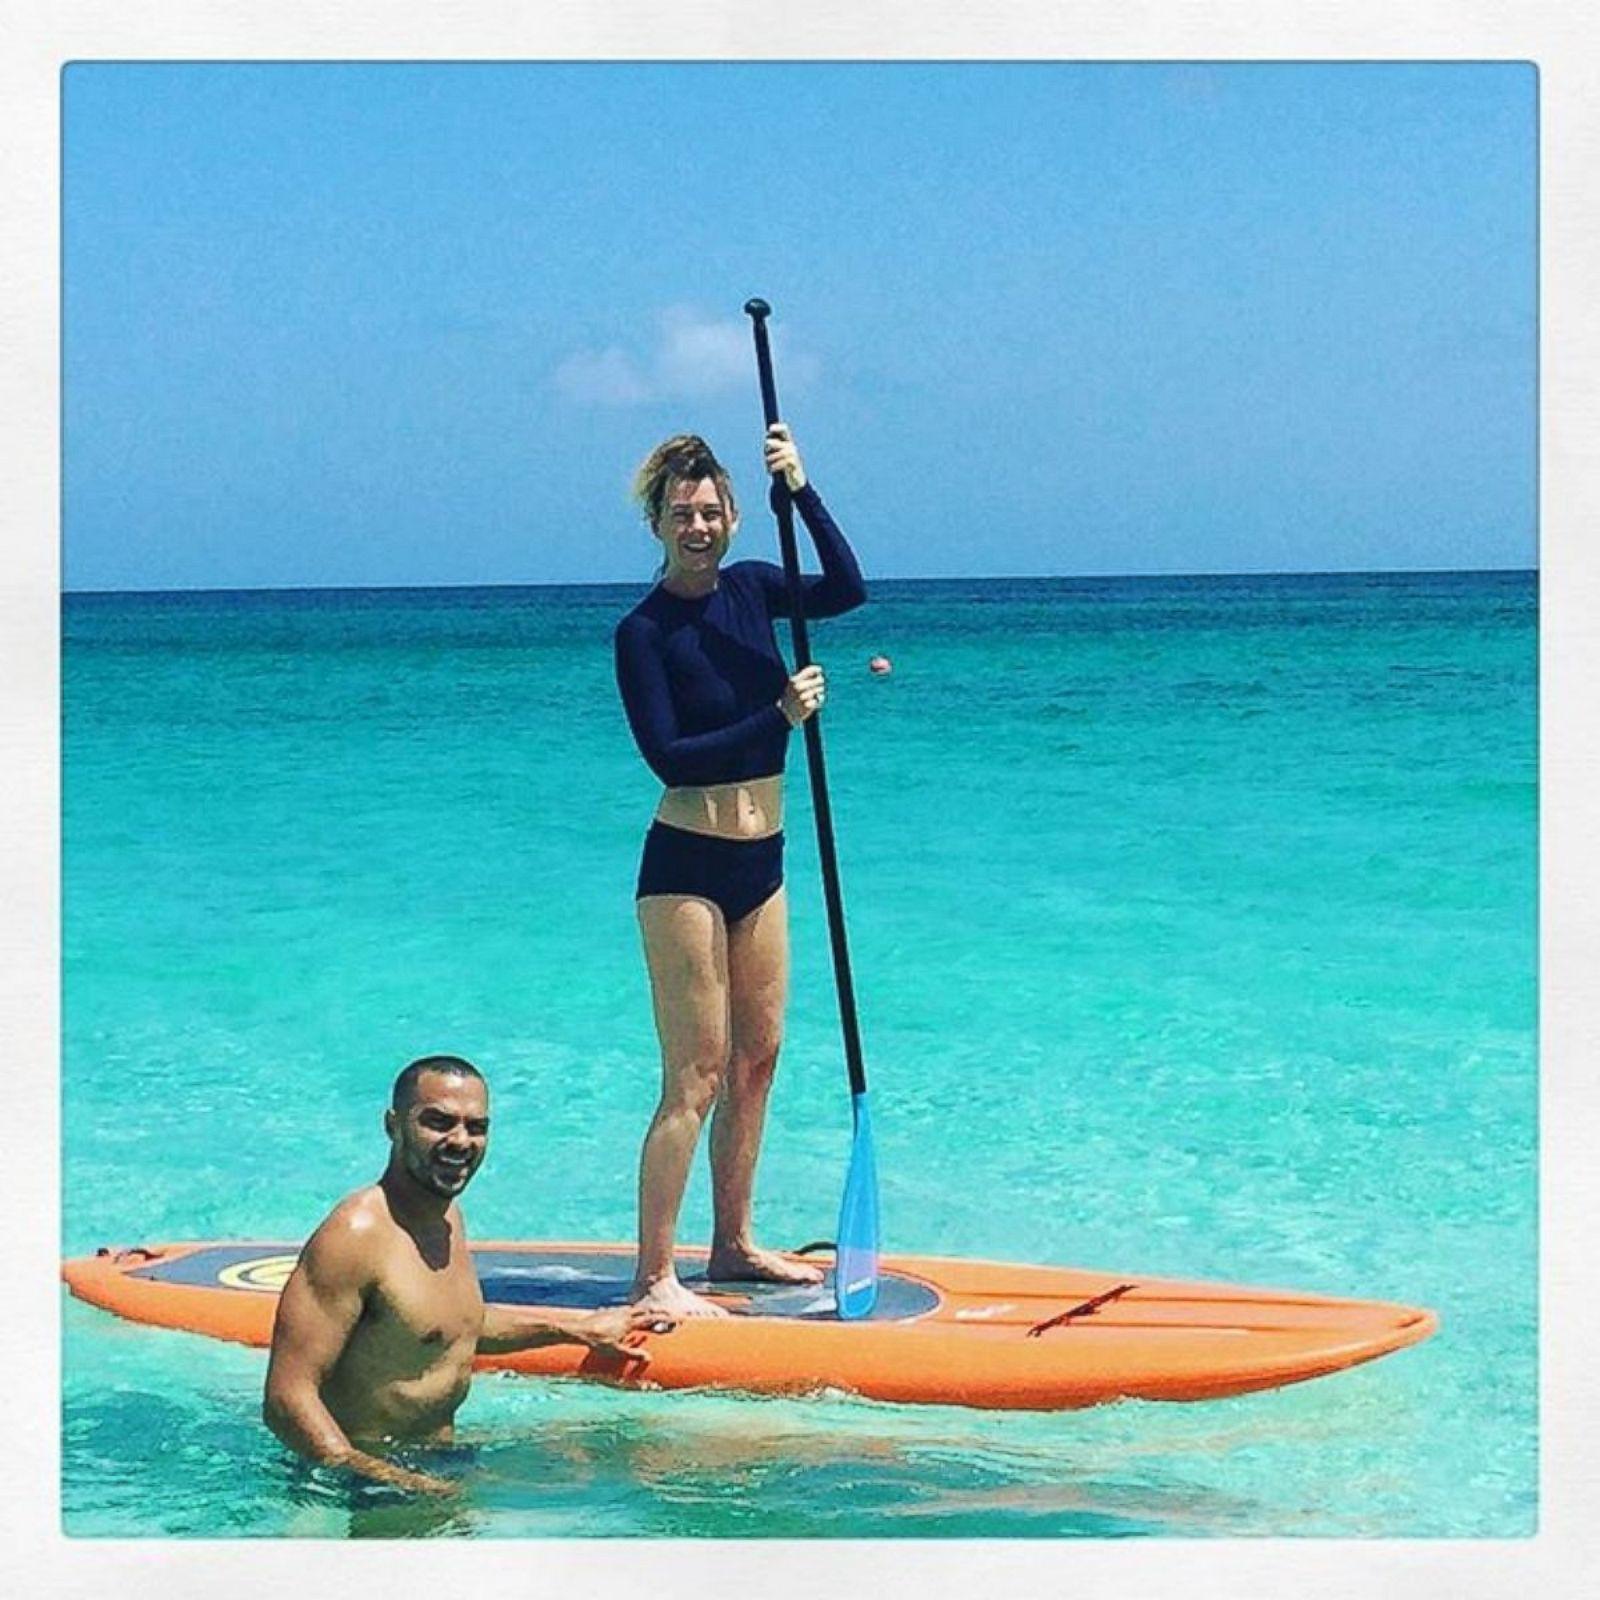 Celebrities on vacation Photos - ABC News